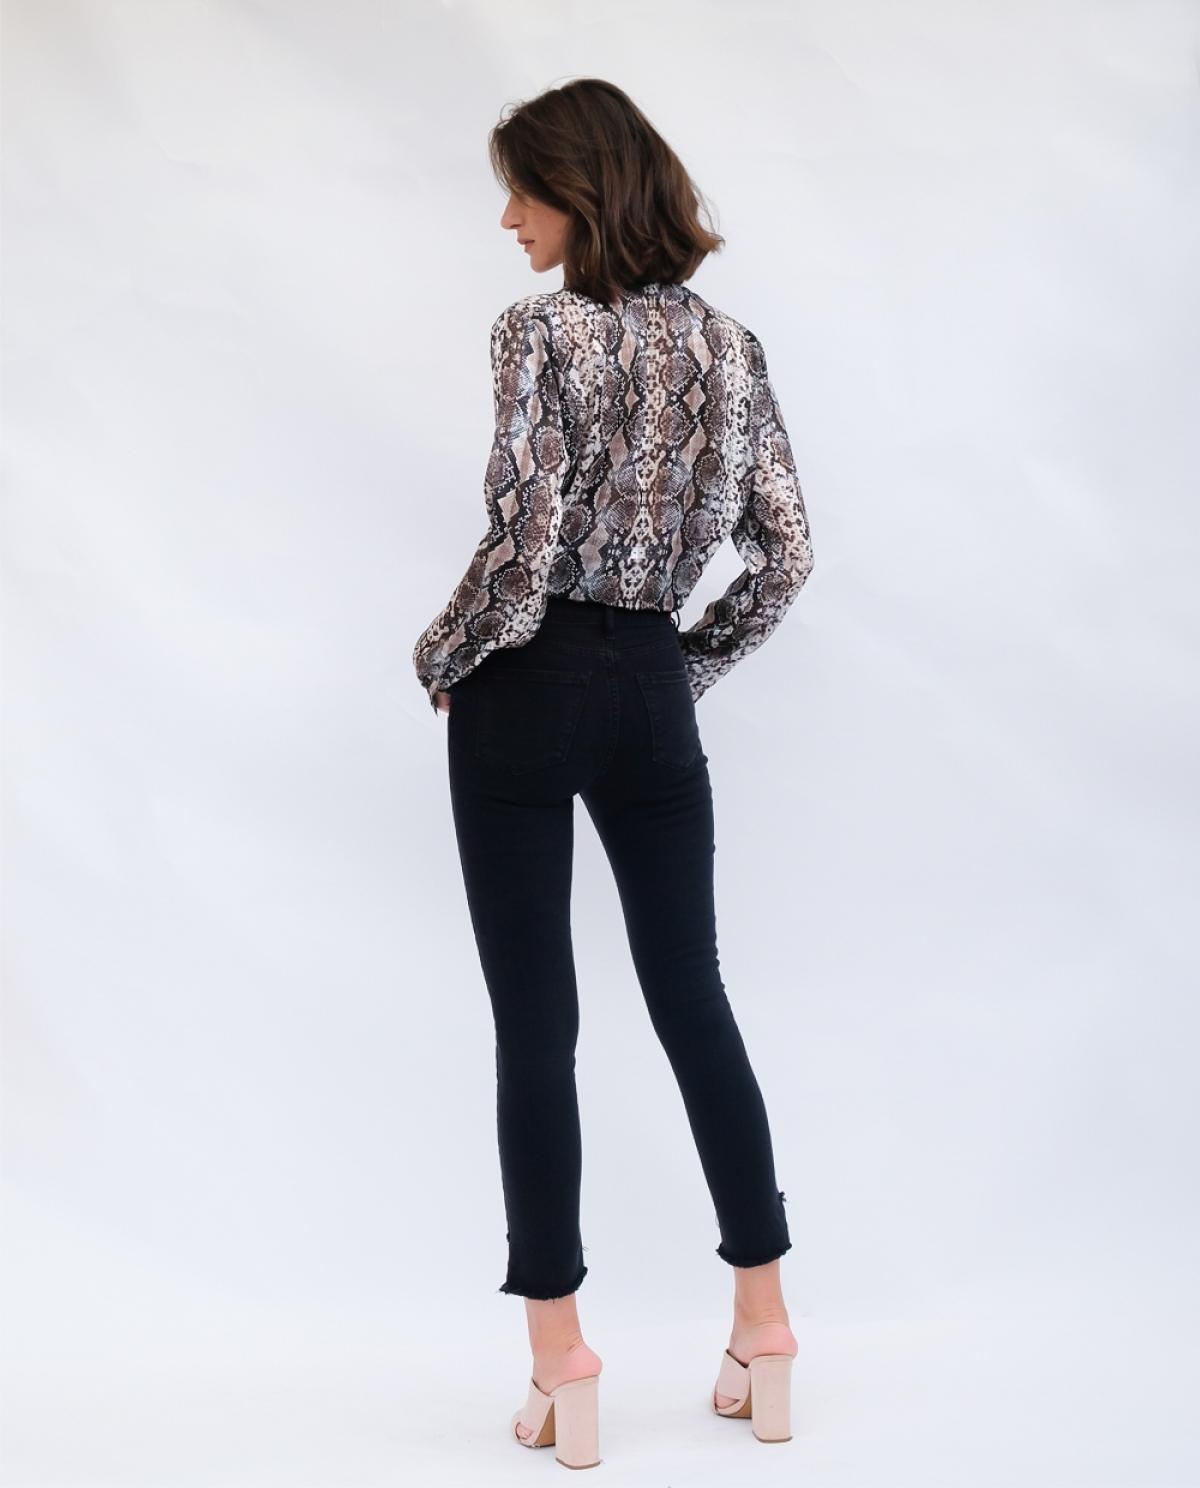 Kate Black S/W Cropped Jeans